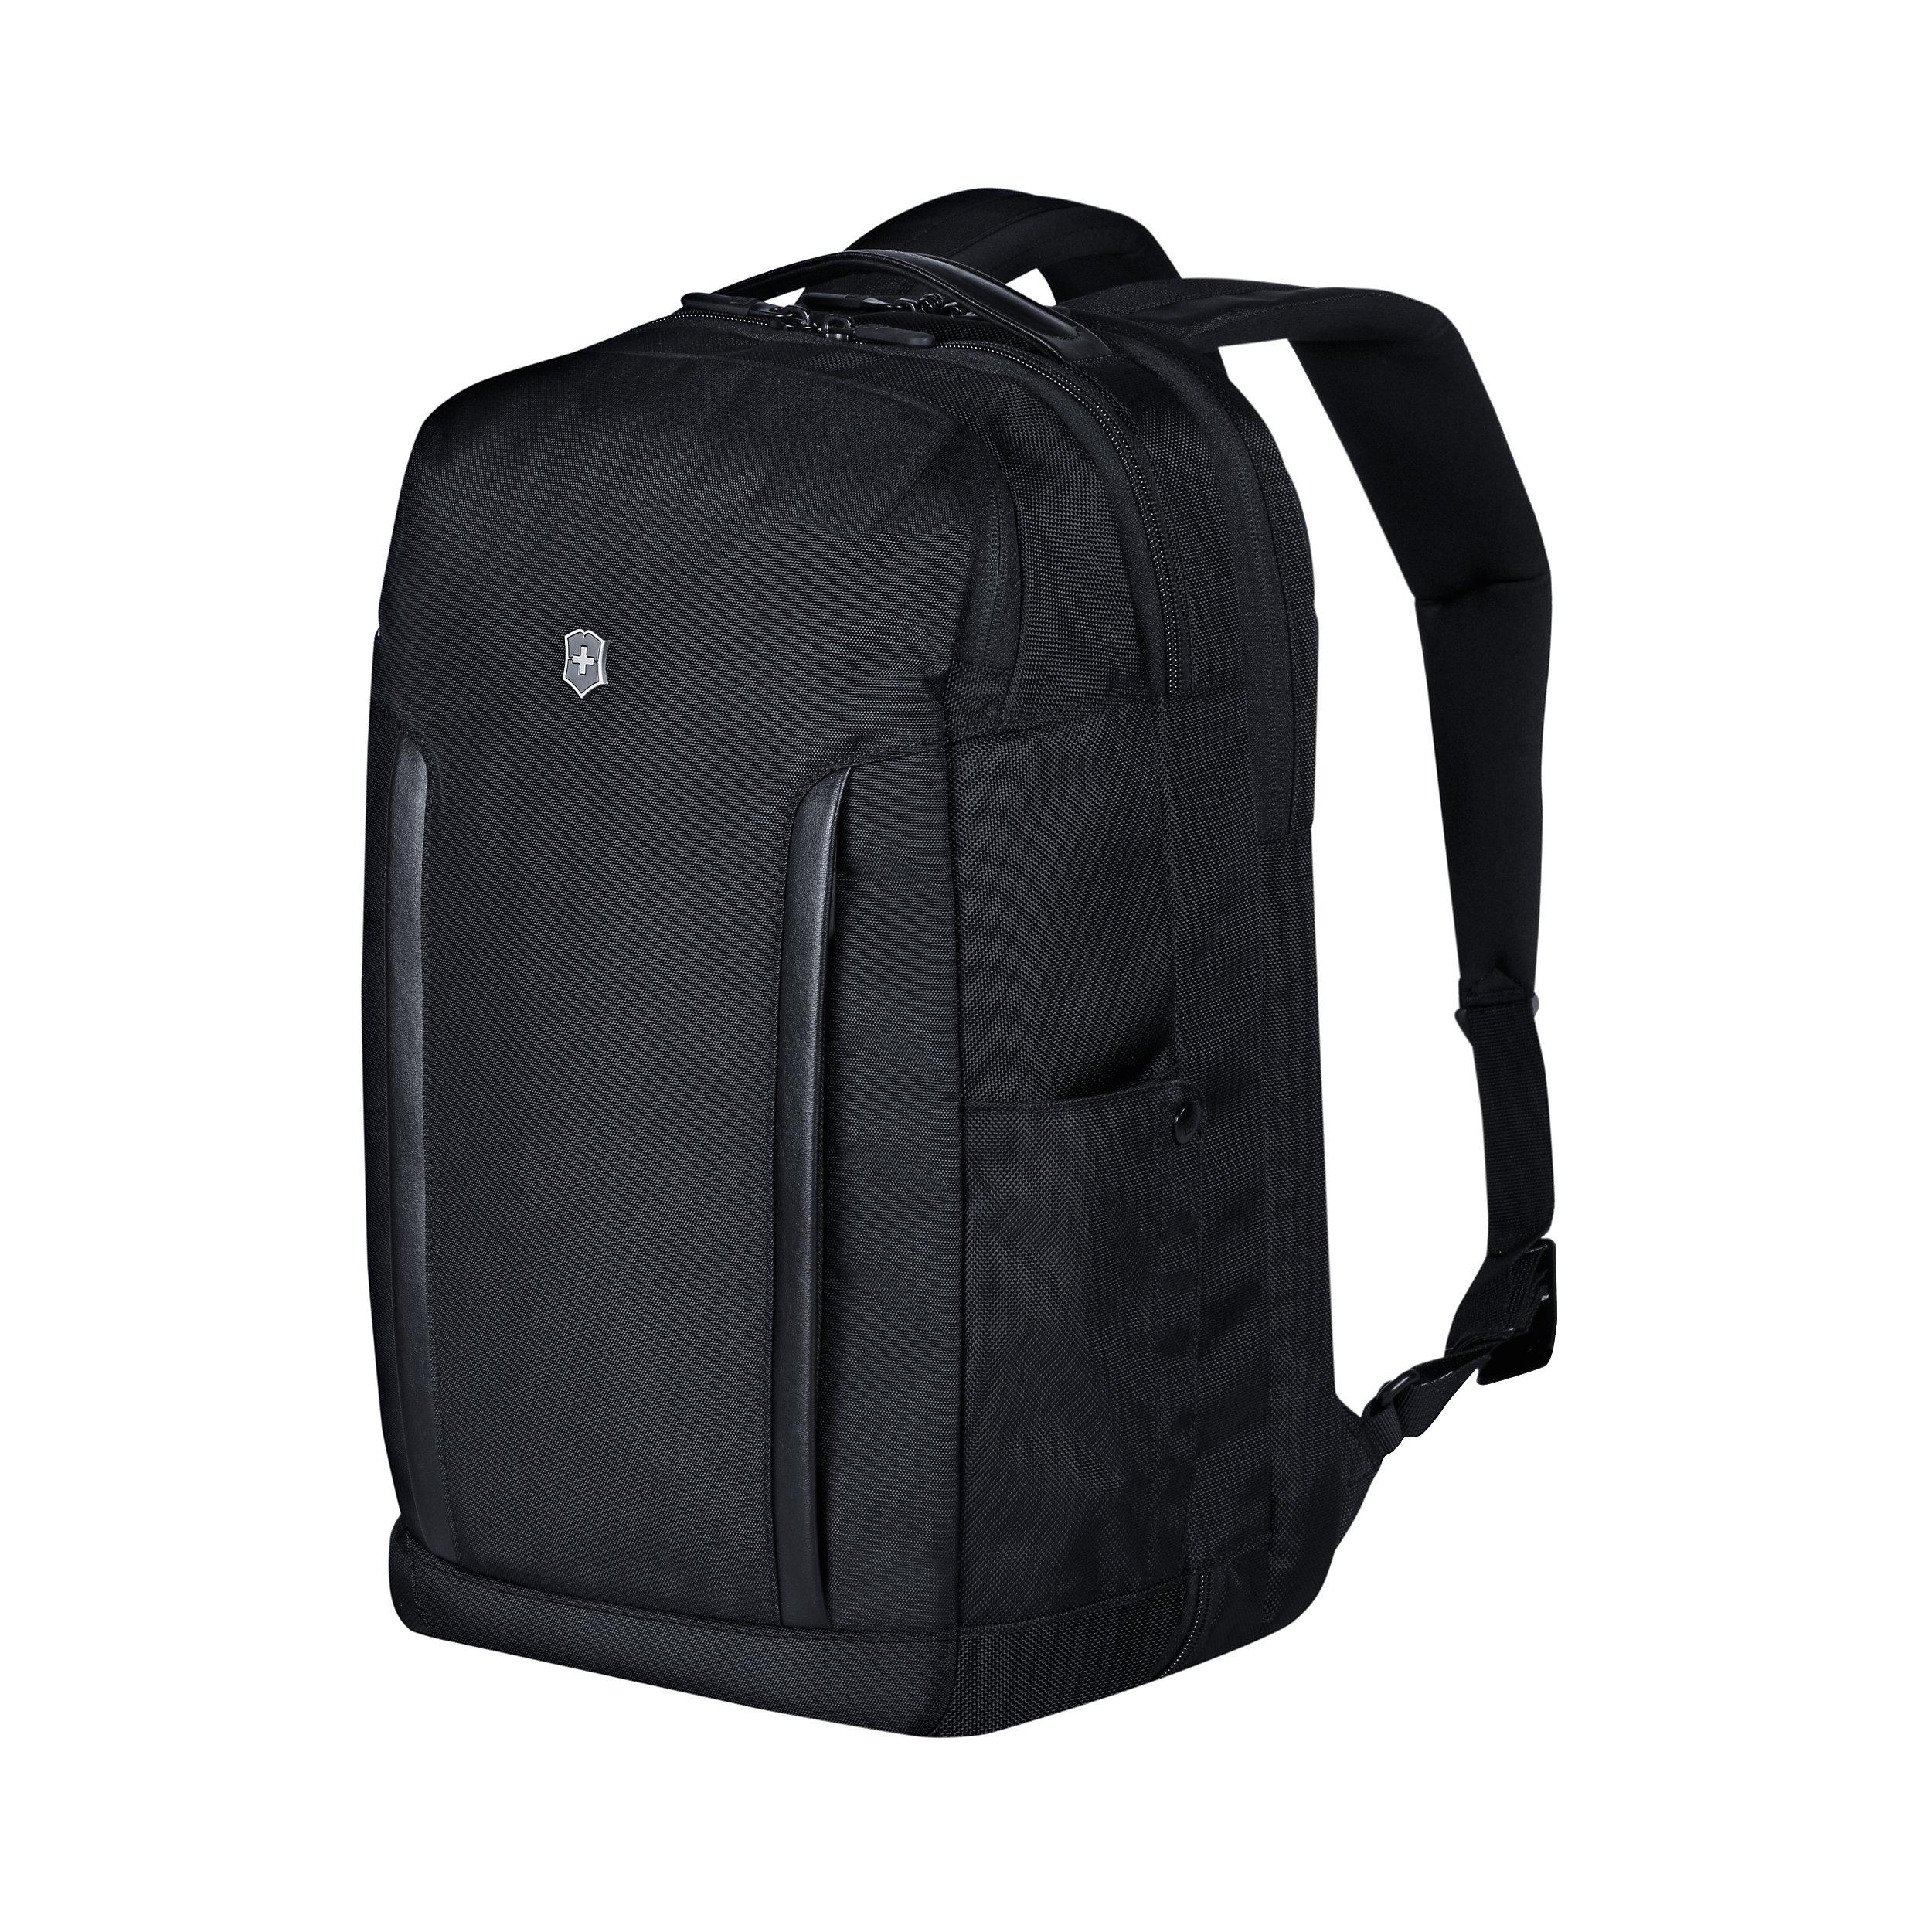 "Laptop Backpack Deluxe Travel 15,4"" Altmont Professional M 24 Liter"